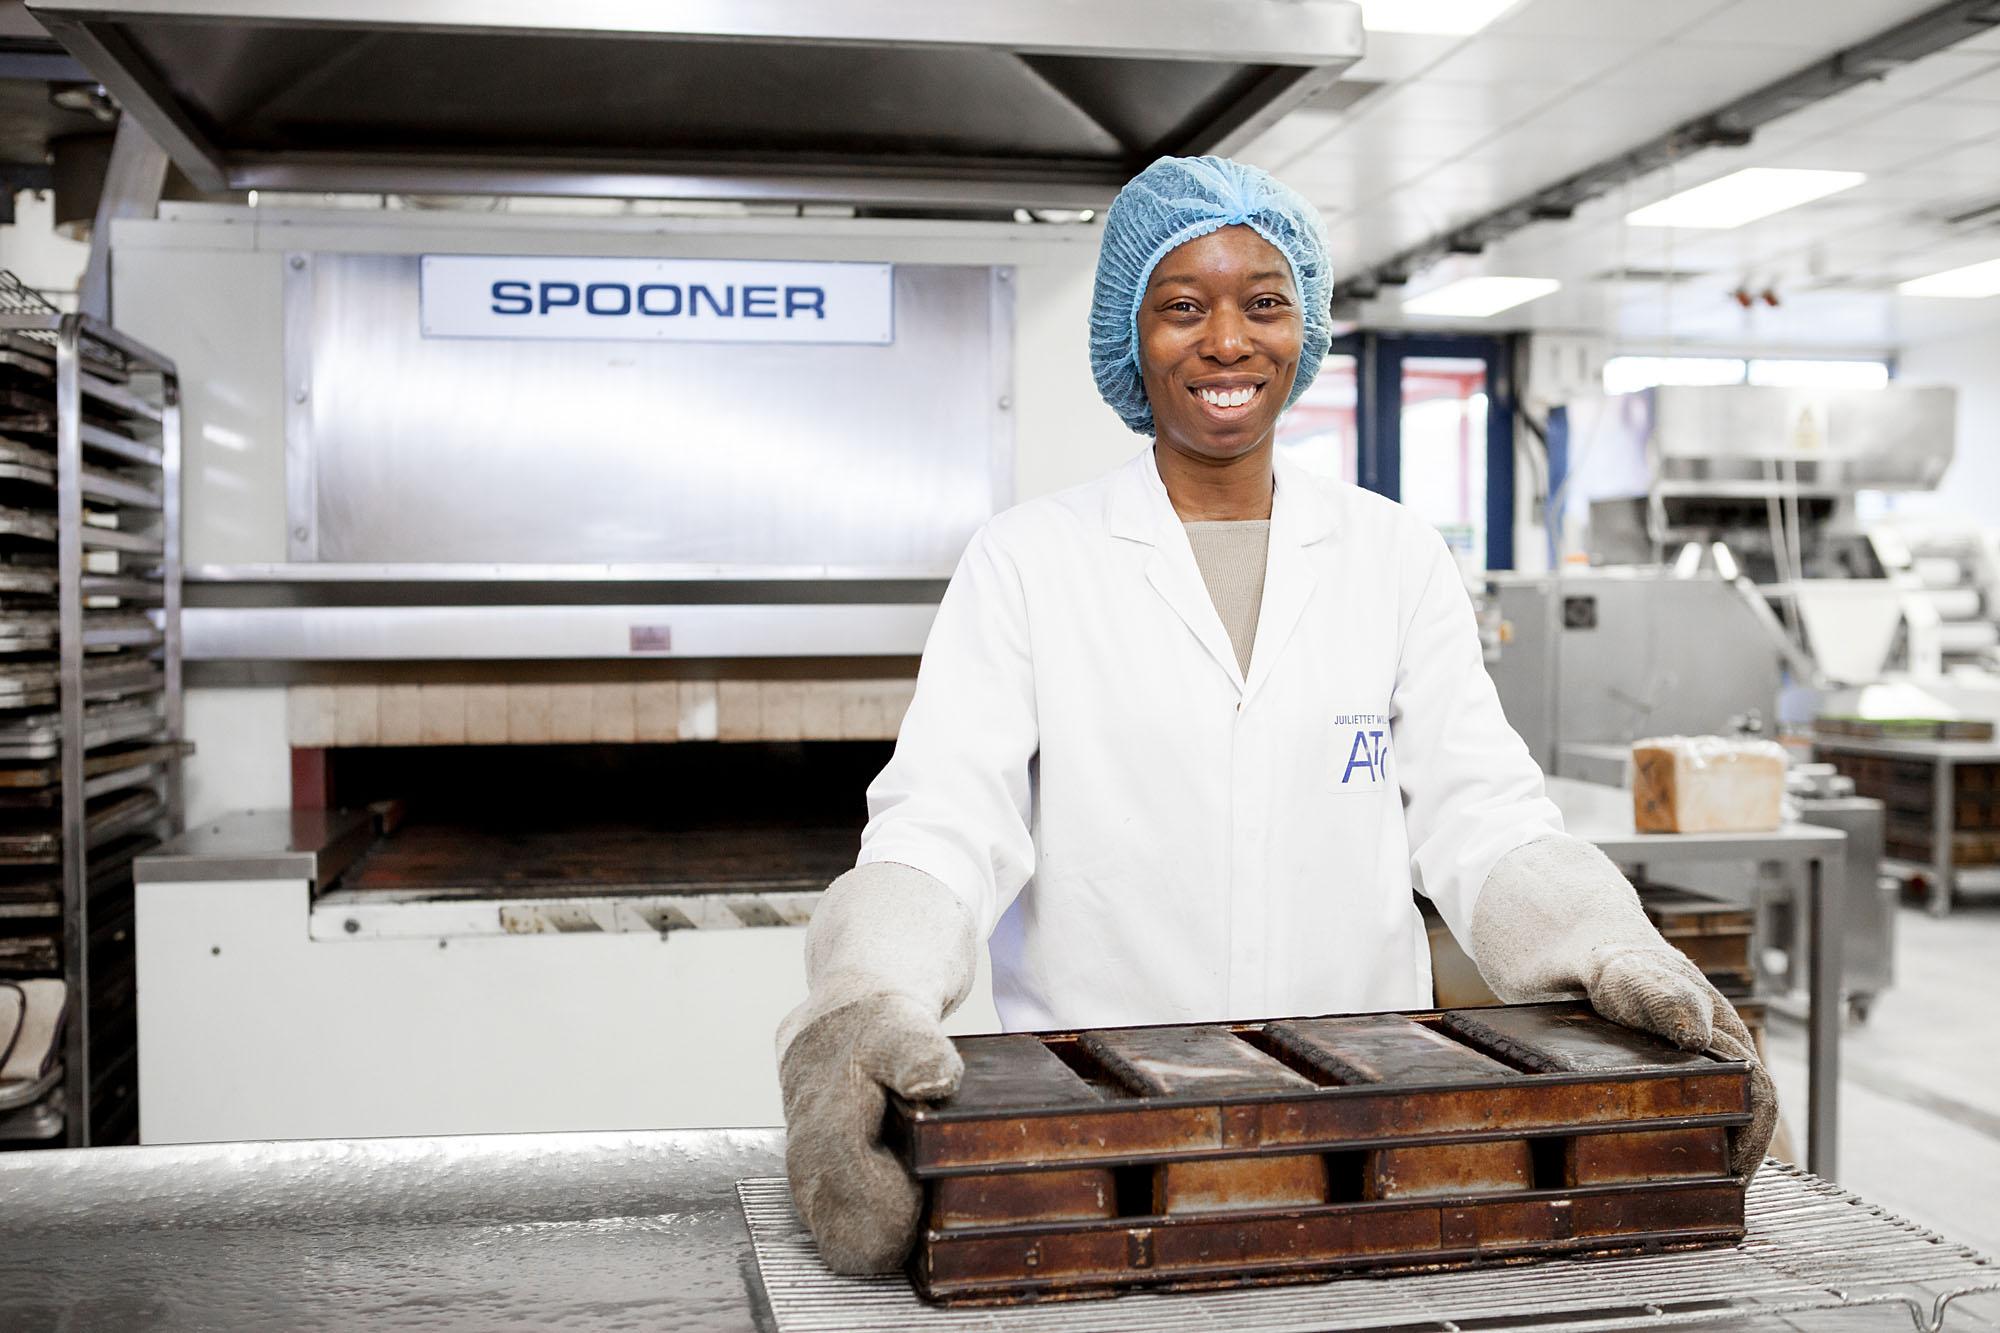 Baker in a kitchen lab - Kingsmill/Allied Bakeries